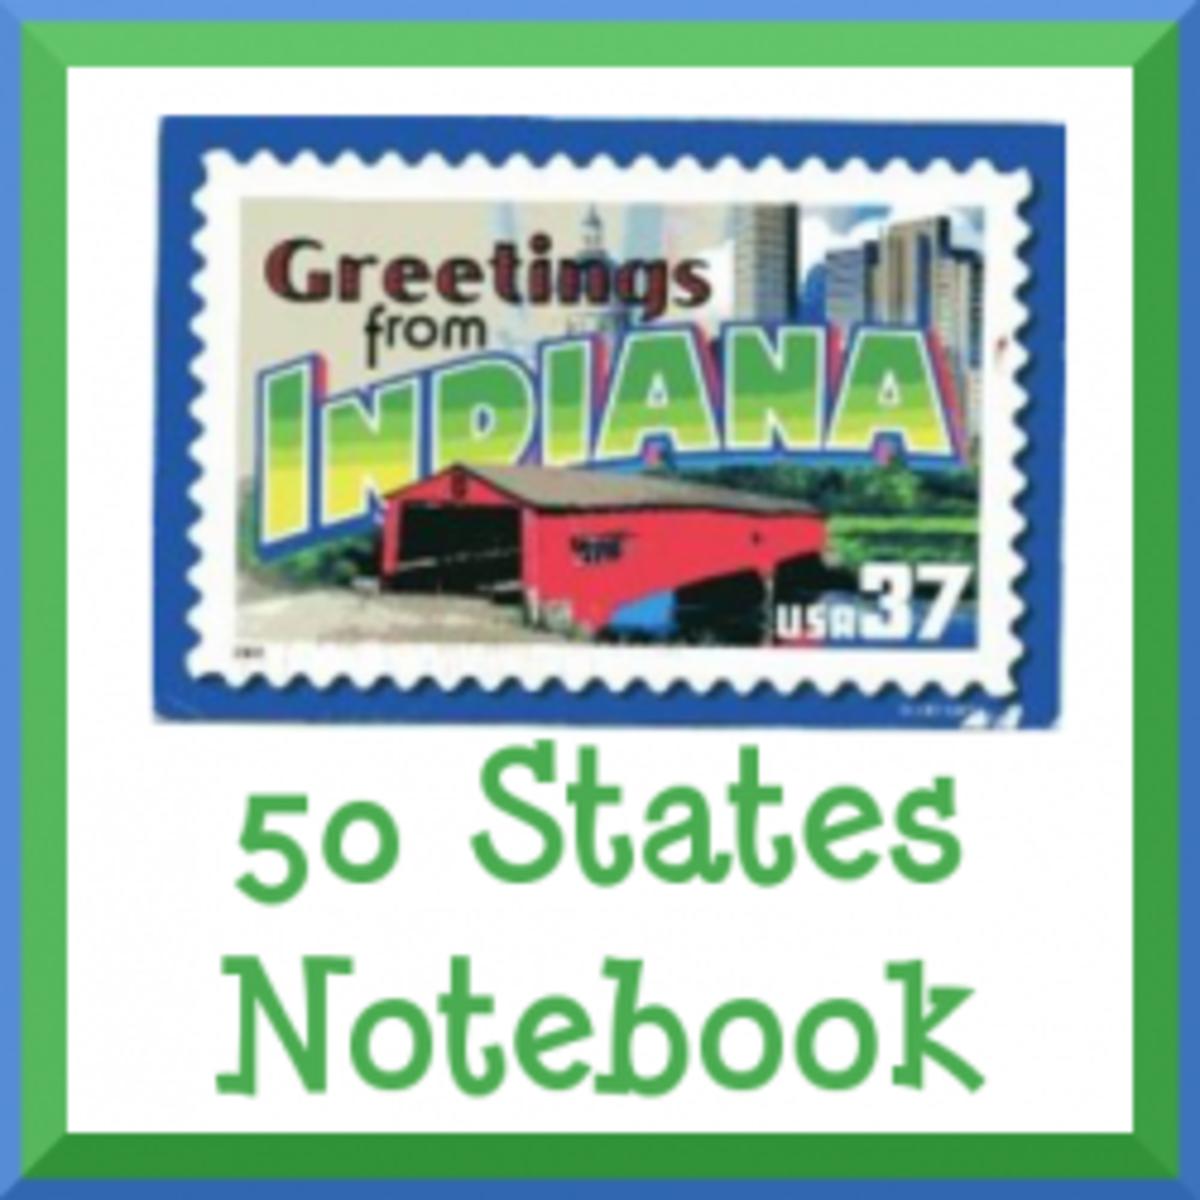 50statesnotebook